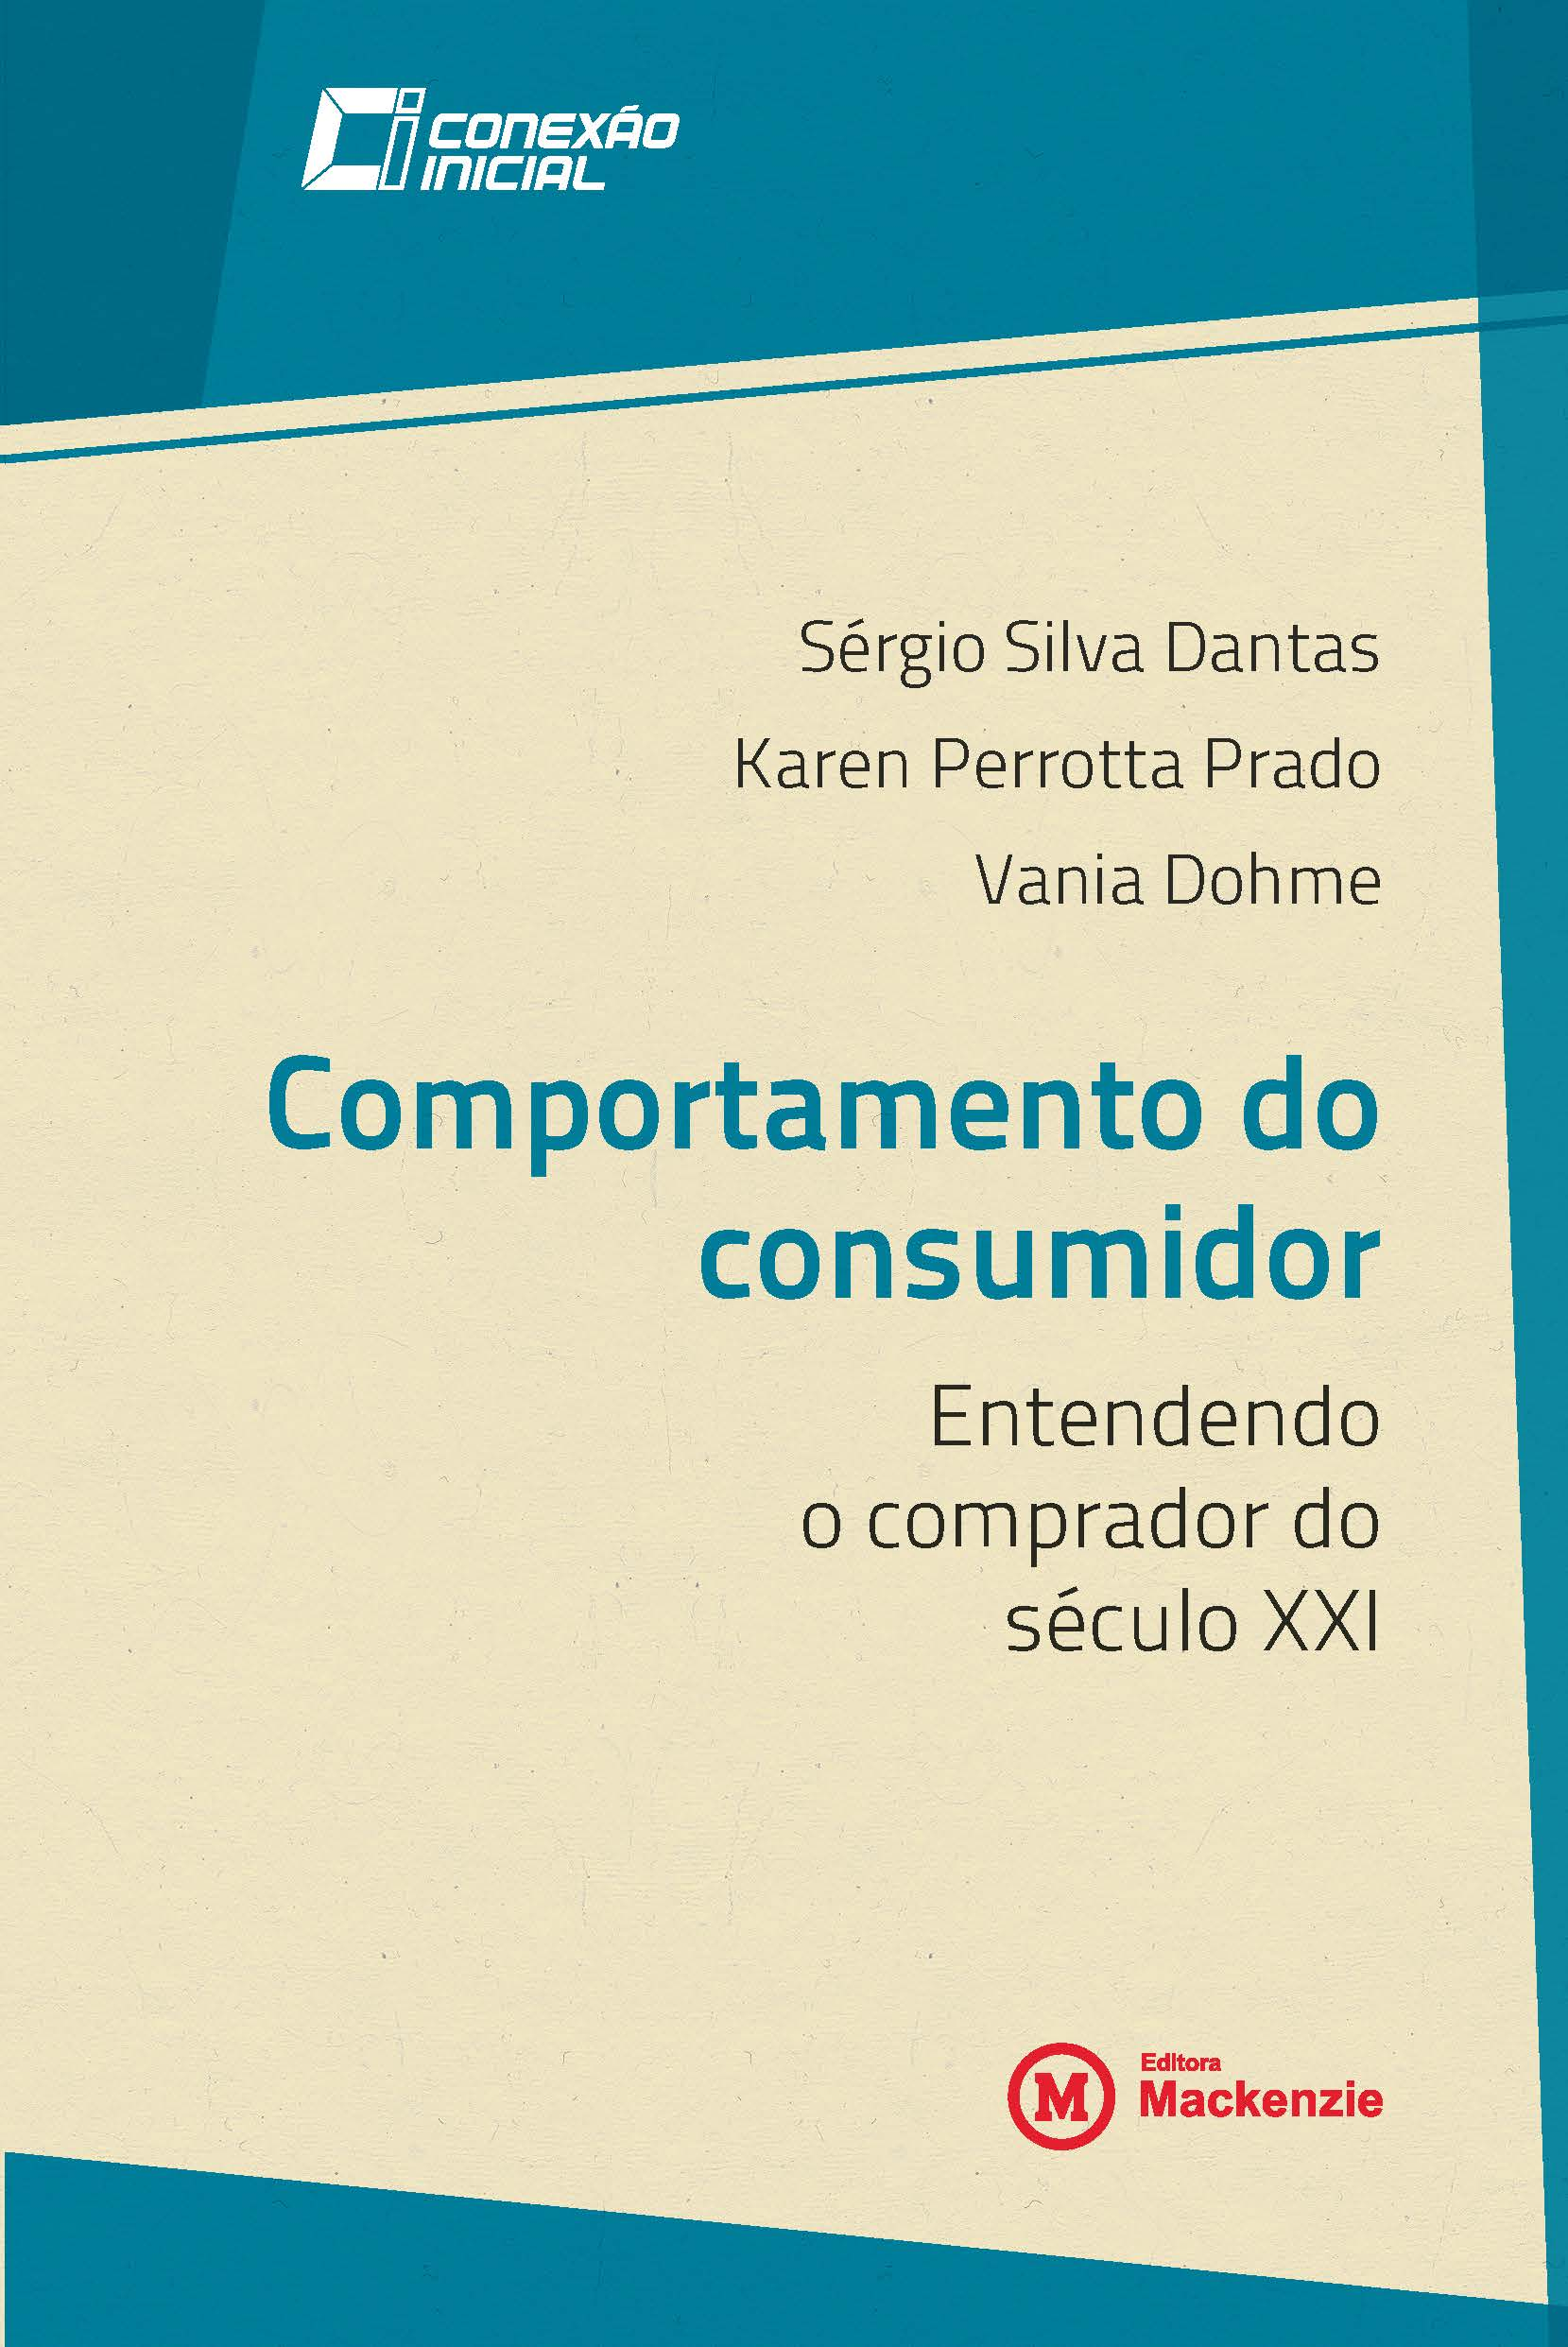 Comportamento do consumidor. Entendendo o comprador do século XXI, livro de Sérgio Silva Dantas, Karen Perrotta Prado, Vania Dohme